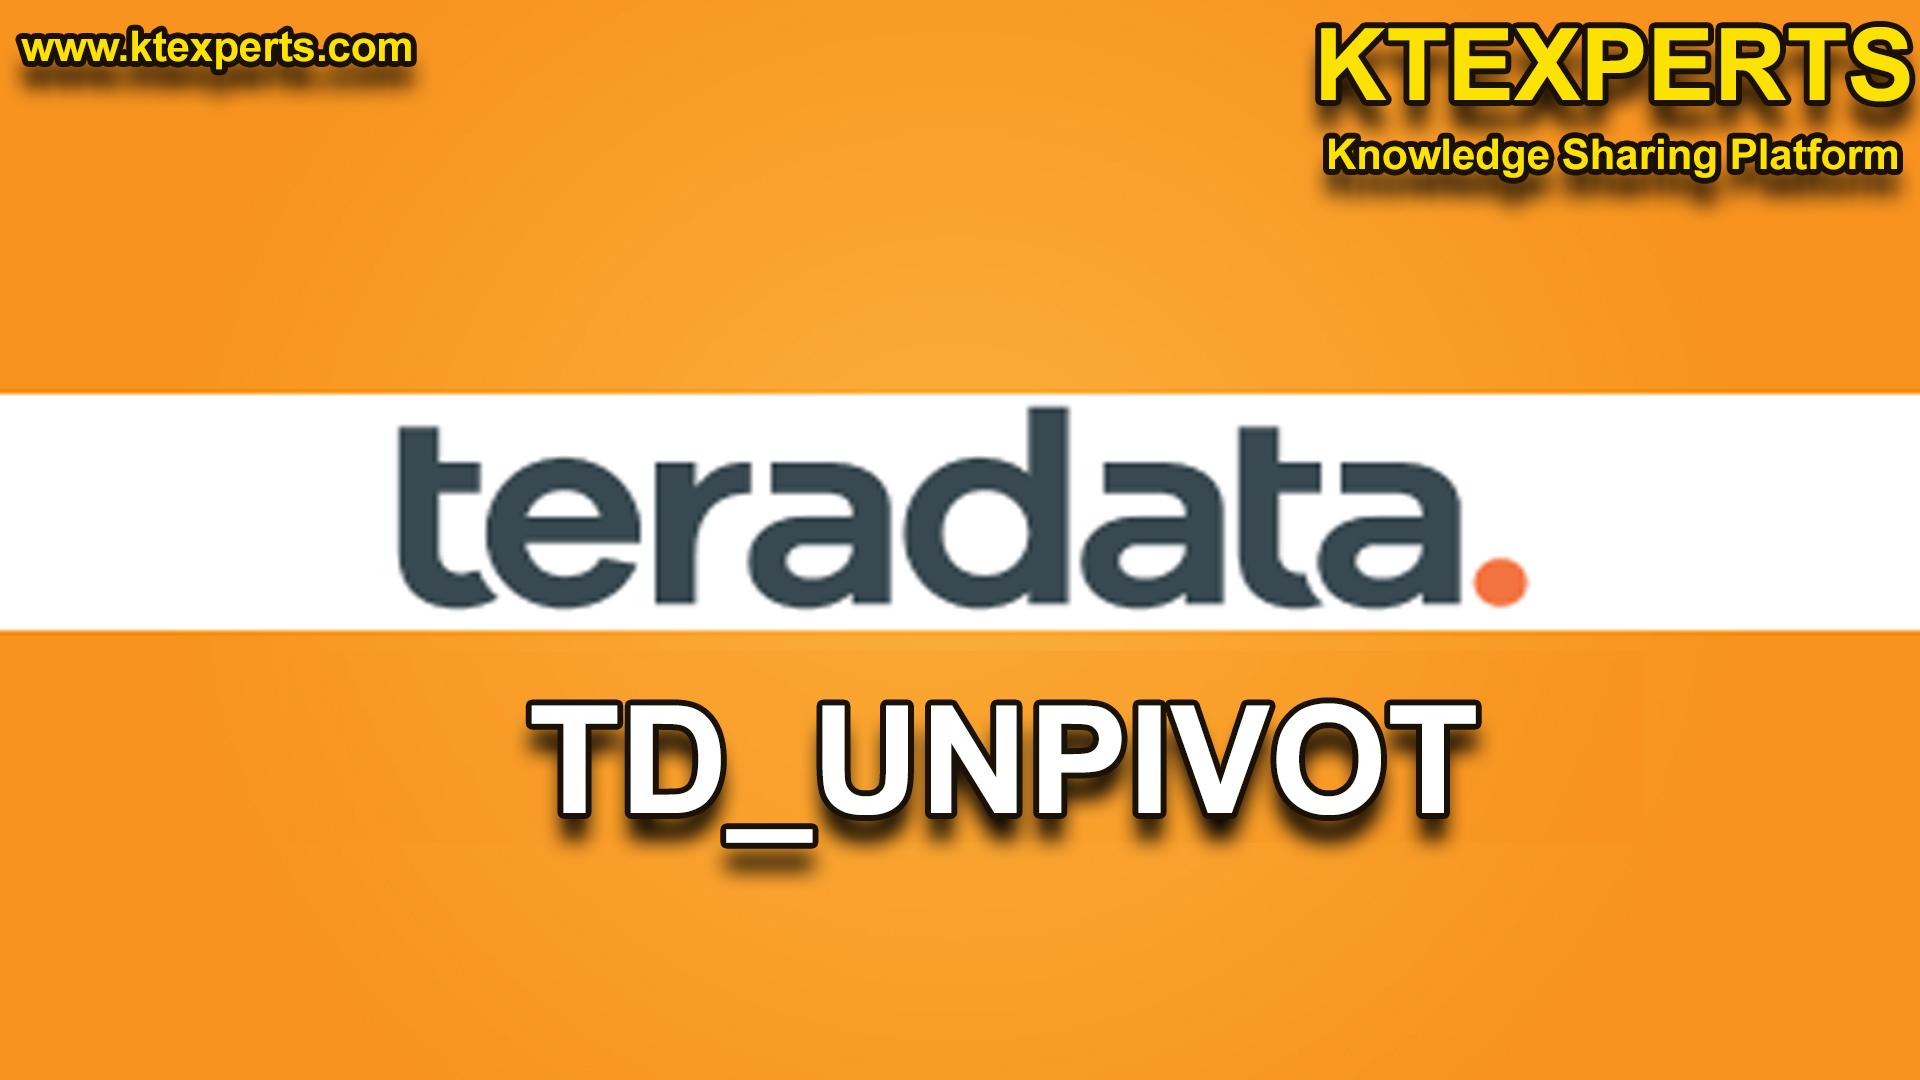 TD_UNPIVOT IN TERADATA